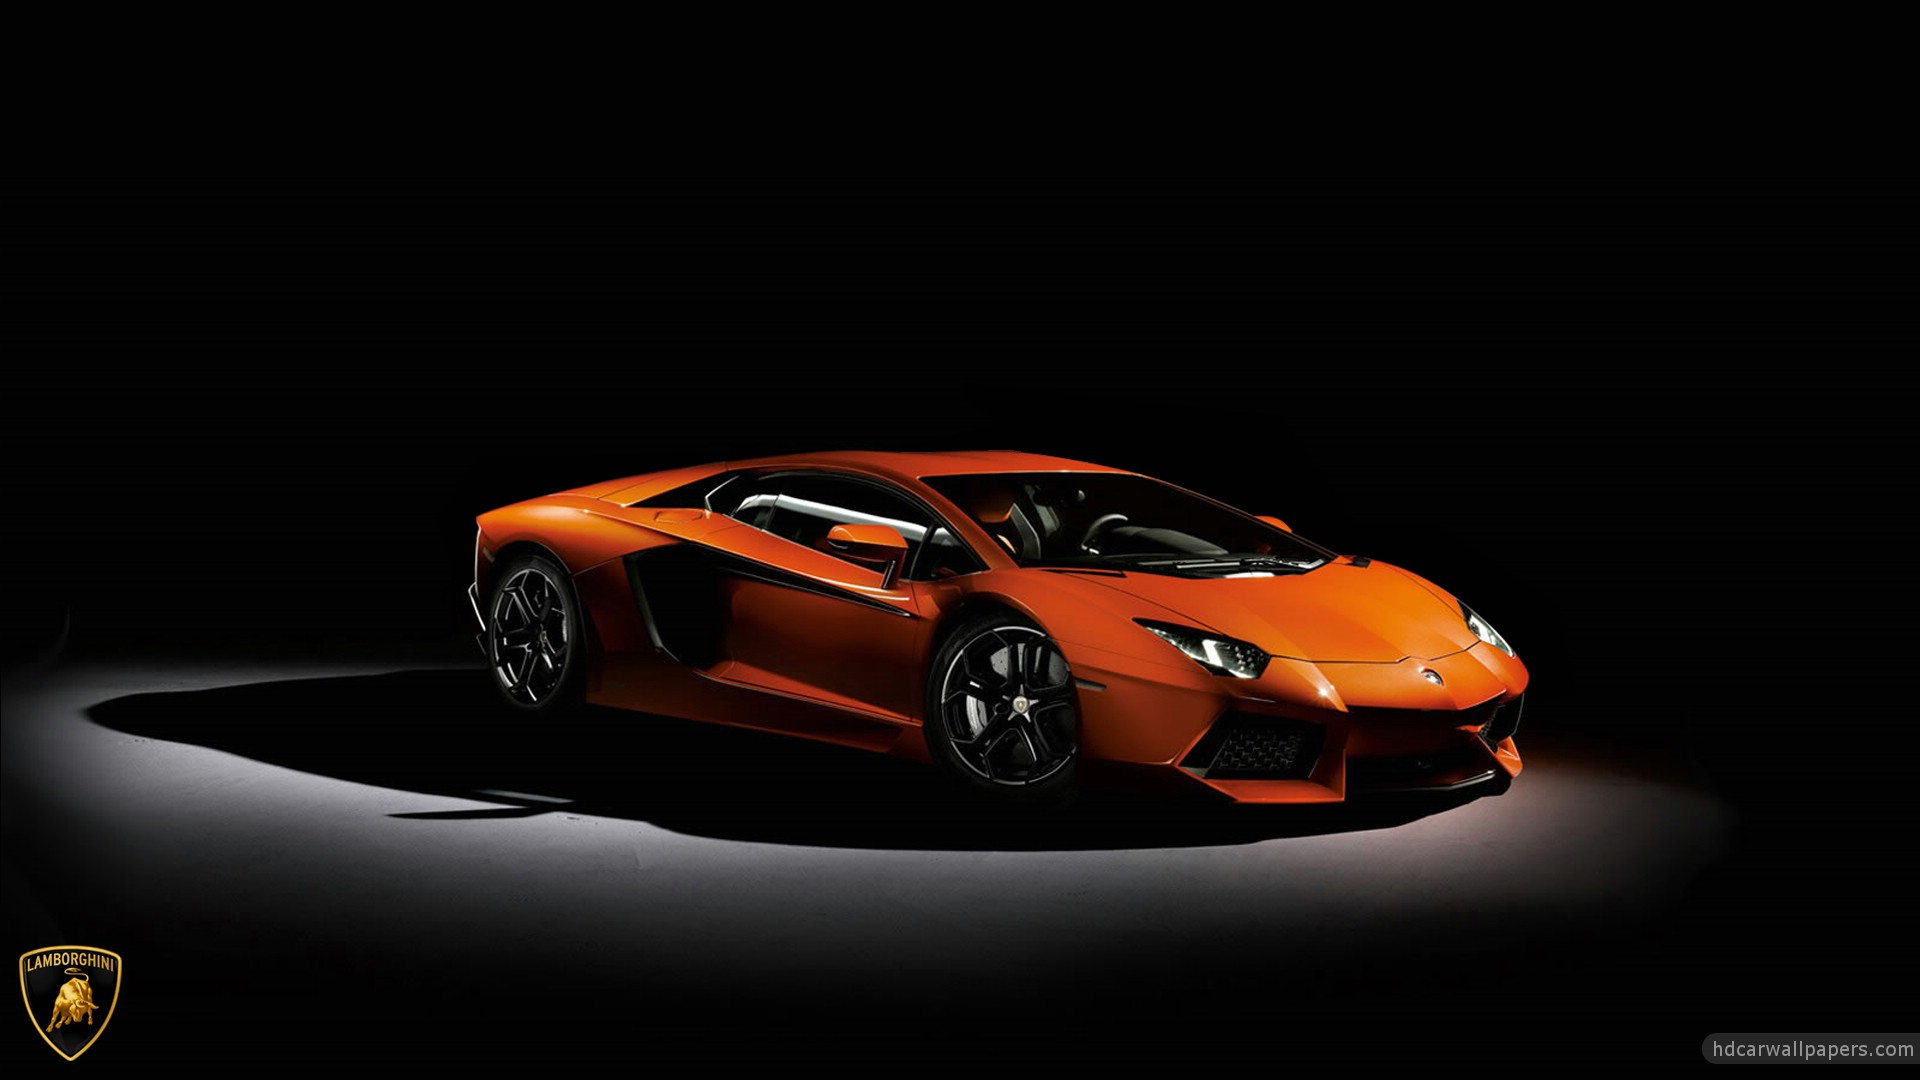 Free Download Lamborghini Aventador Hd Wallpaper Hd Car Wallpapers